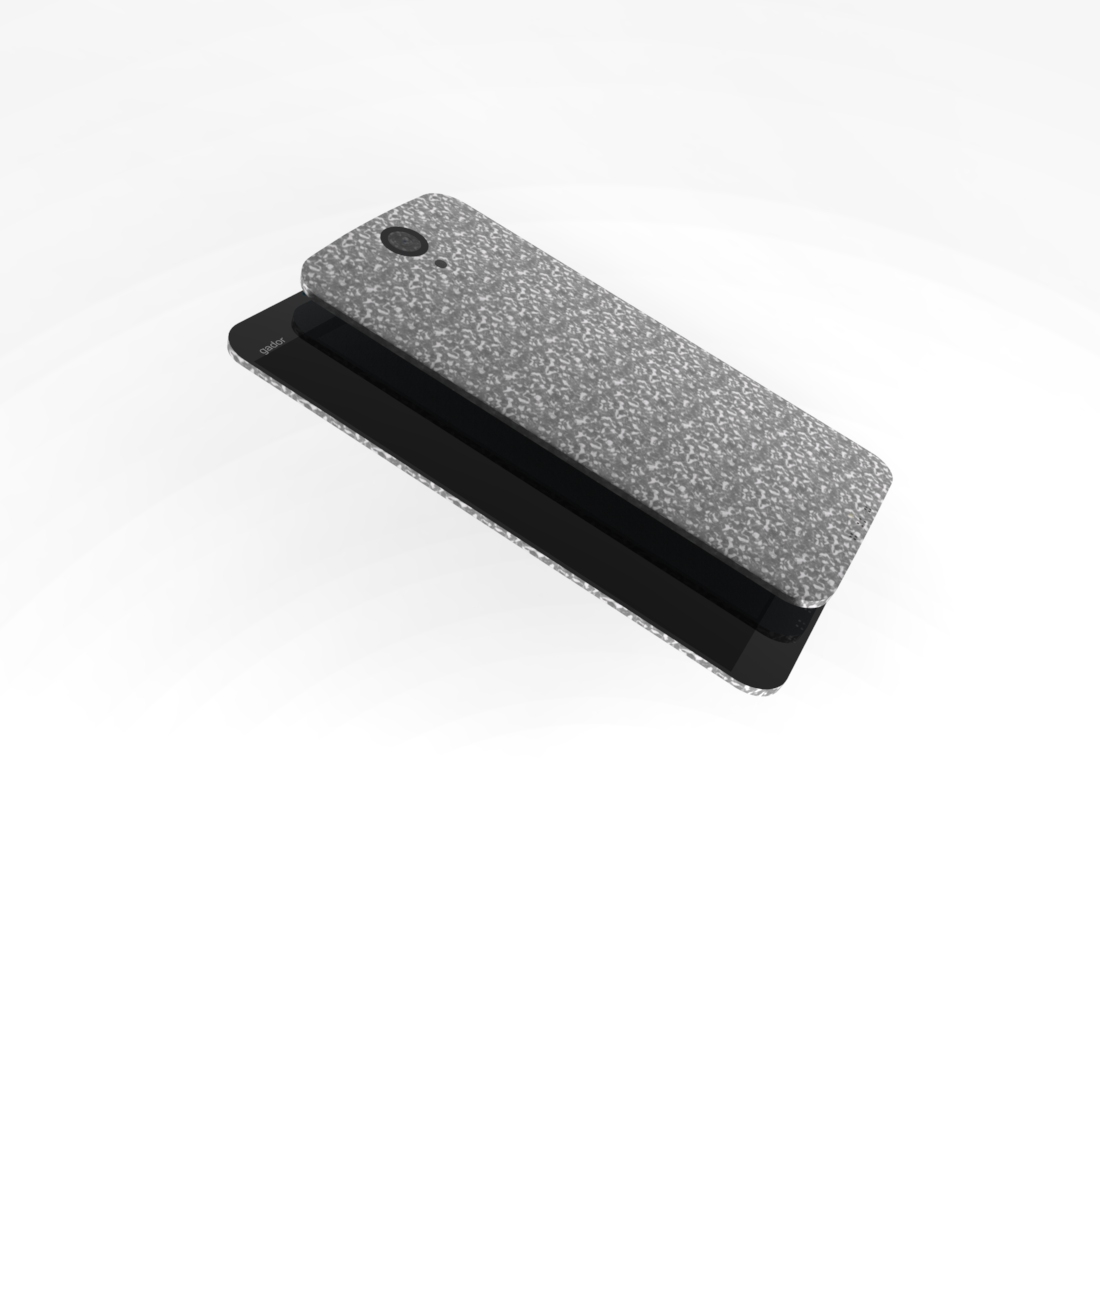 Gador-X-concept-phone-5